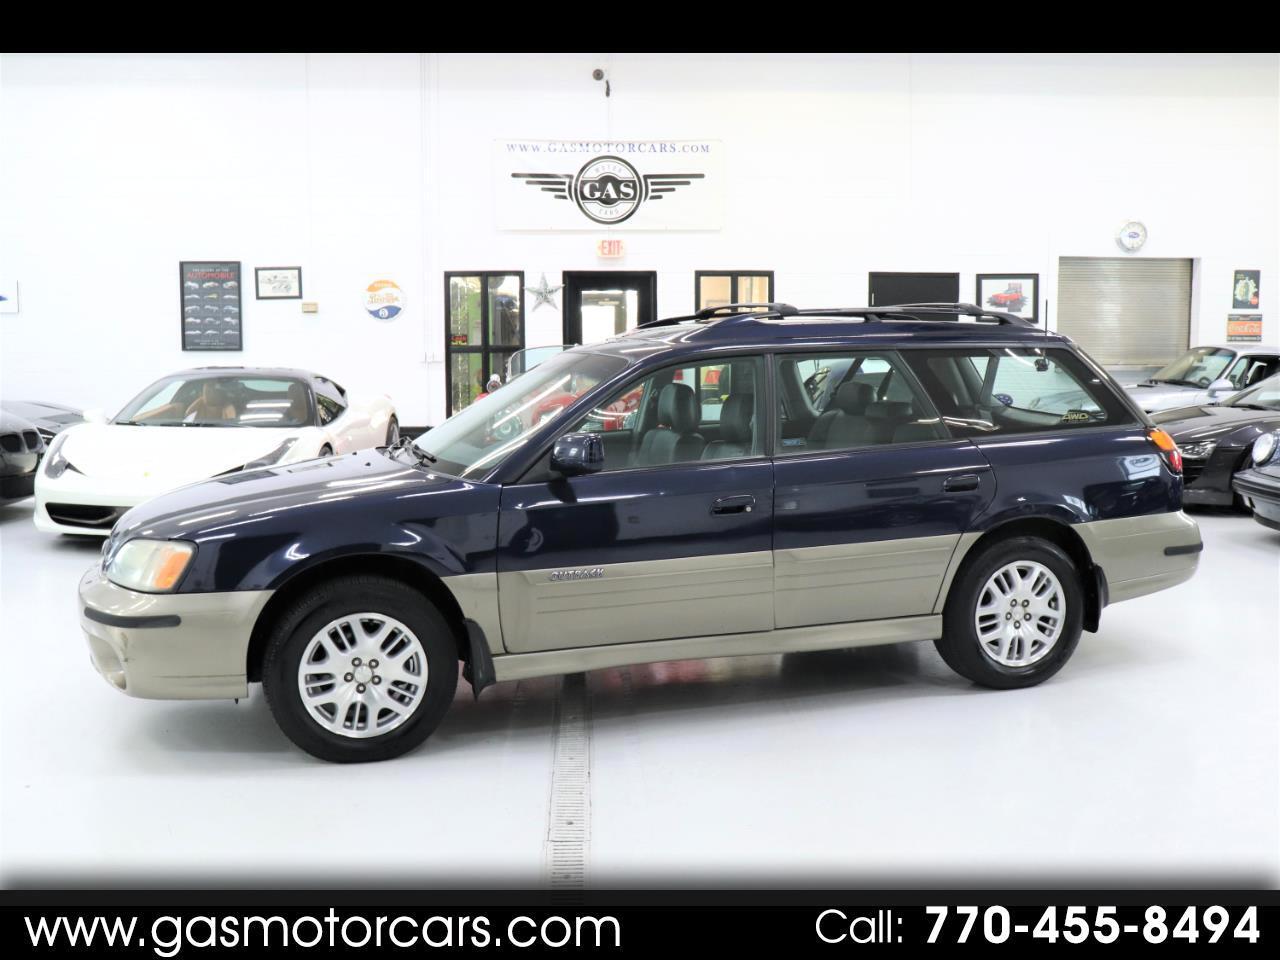 2004 Subaru Outback Limited Wagon